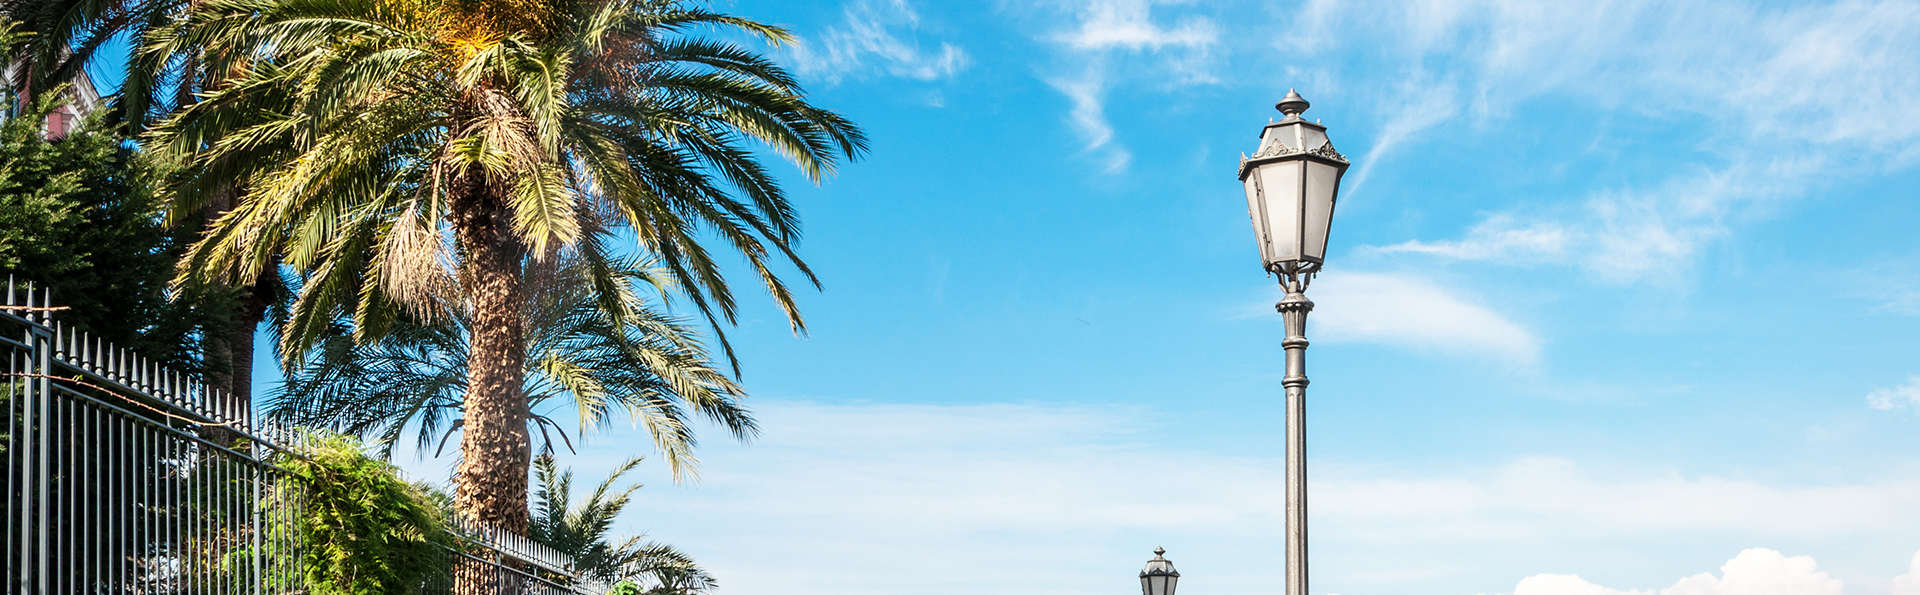 Hotel Garibaldi - Edit_destination.jpg